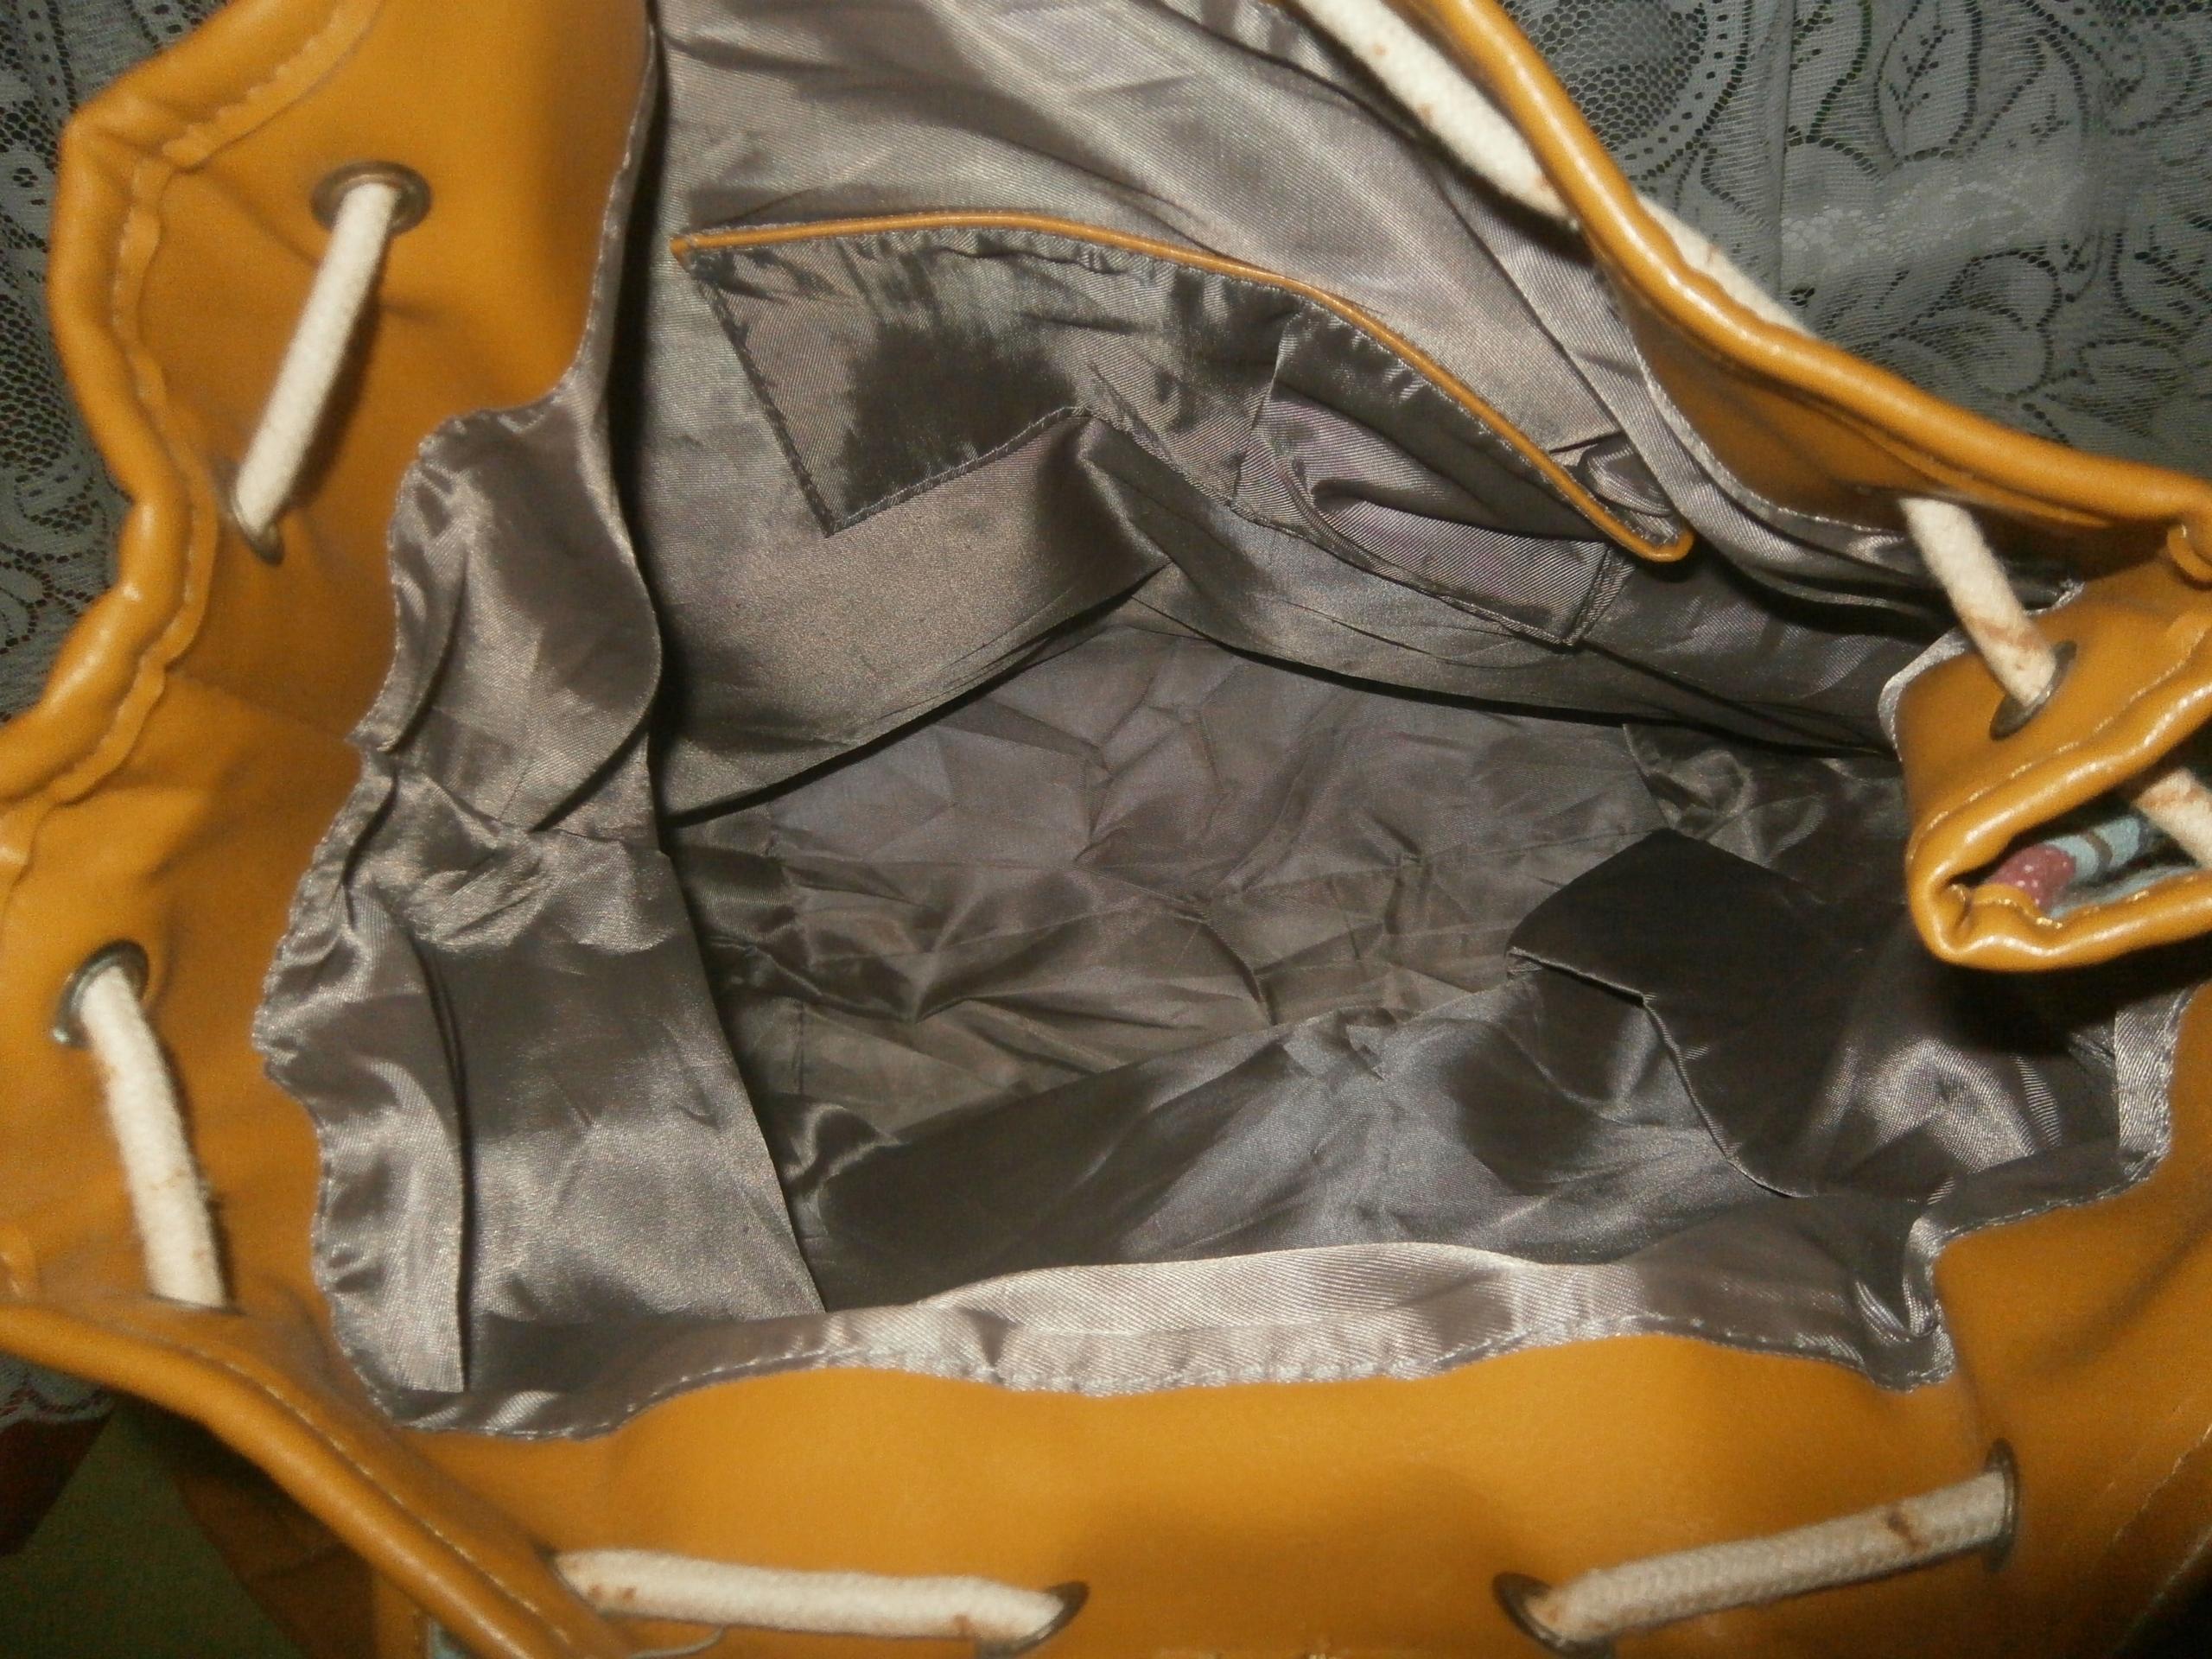 f529e74ff18de Plecak tekstylny -duży - 7655967054 - oficjalne archiwum allegro